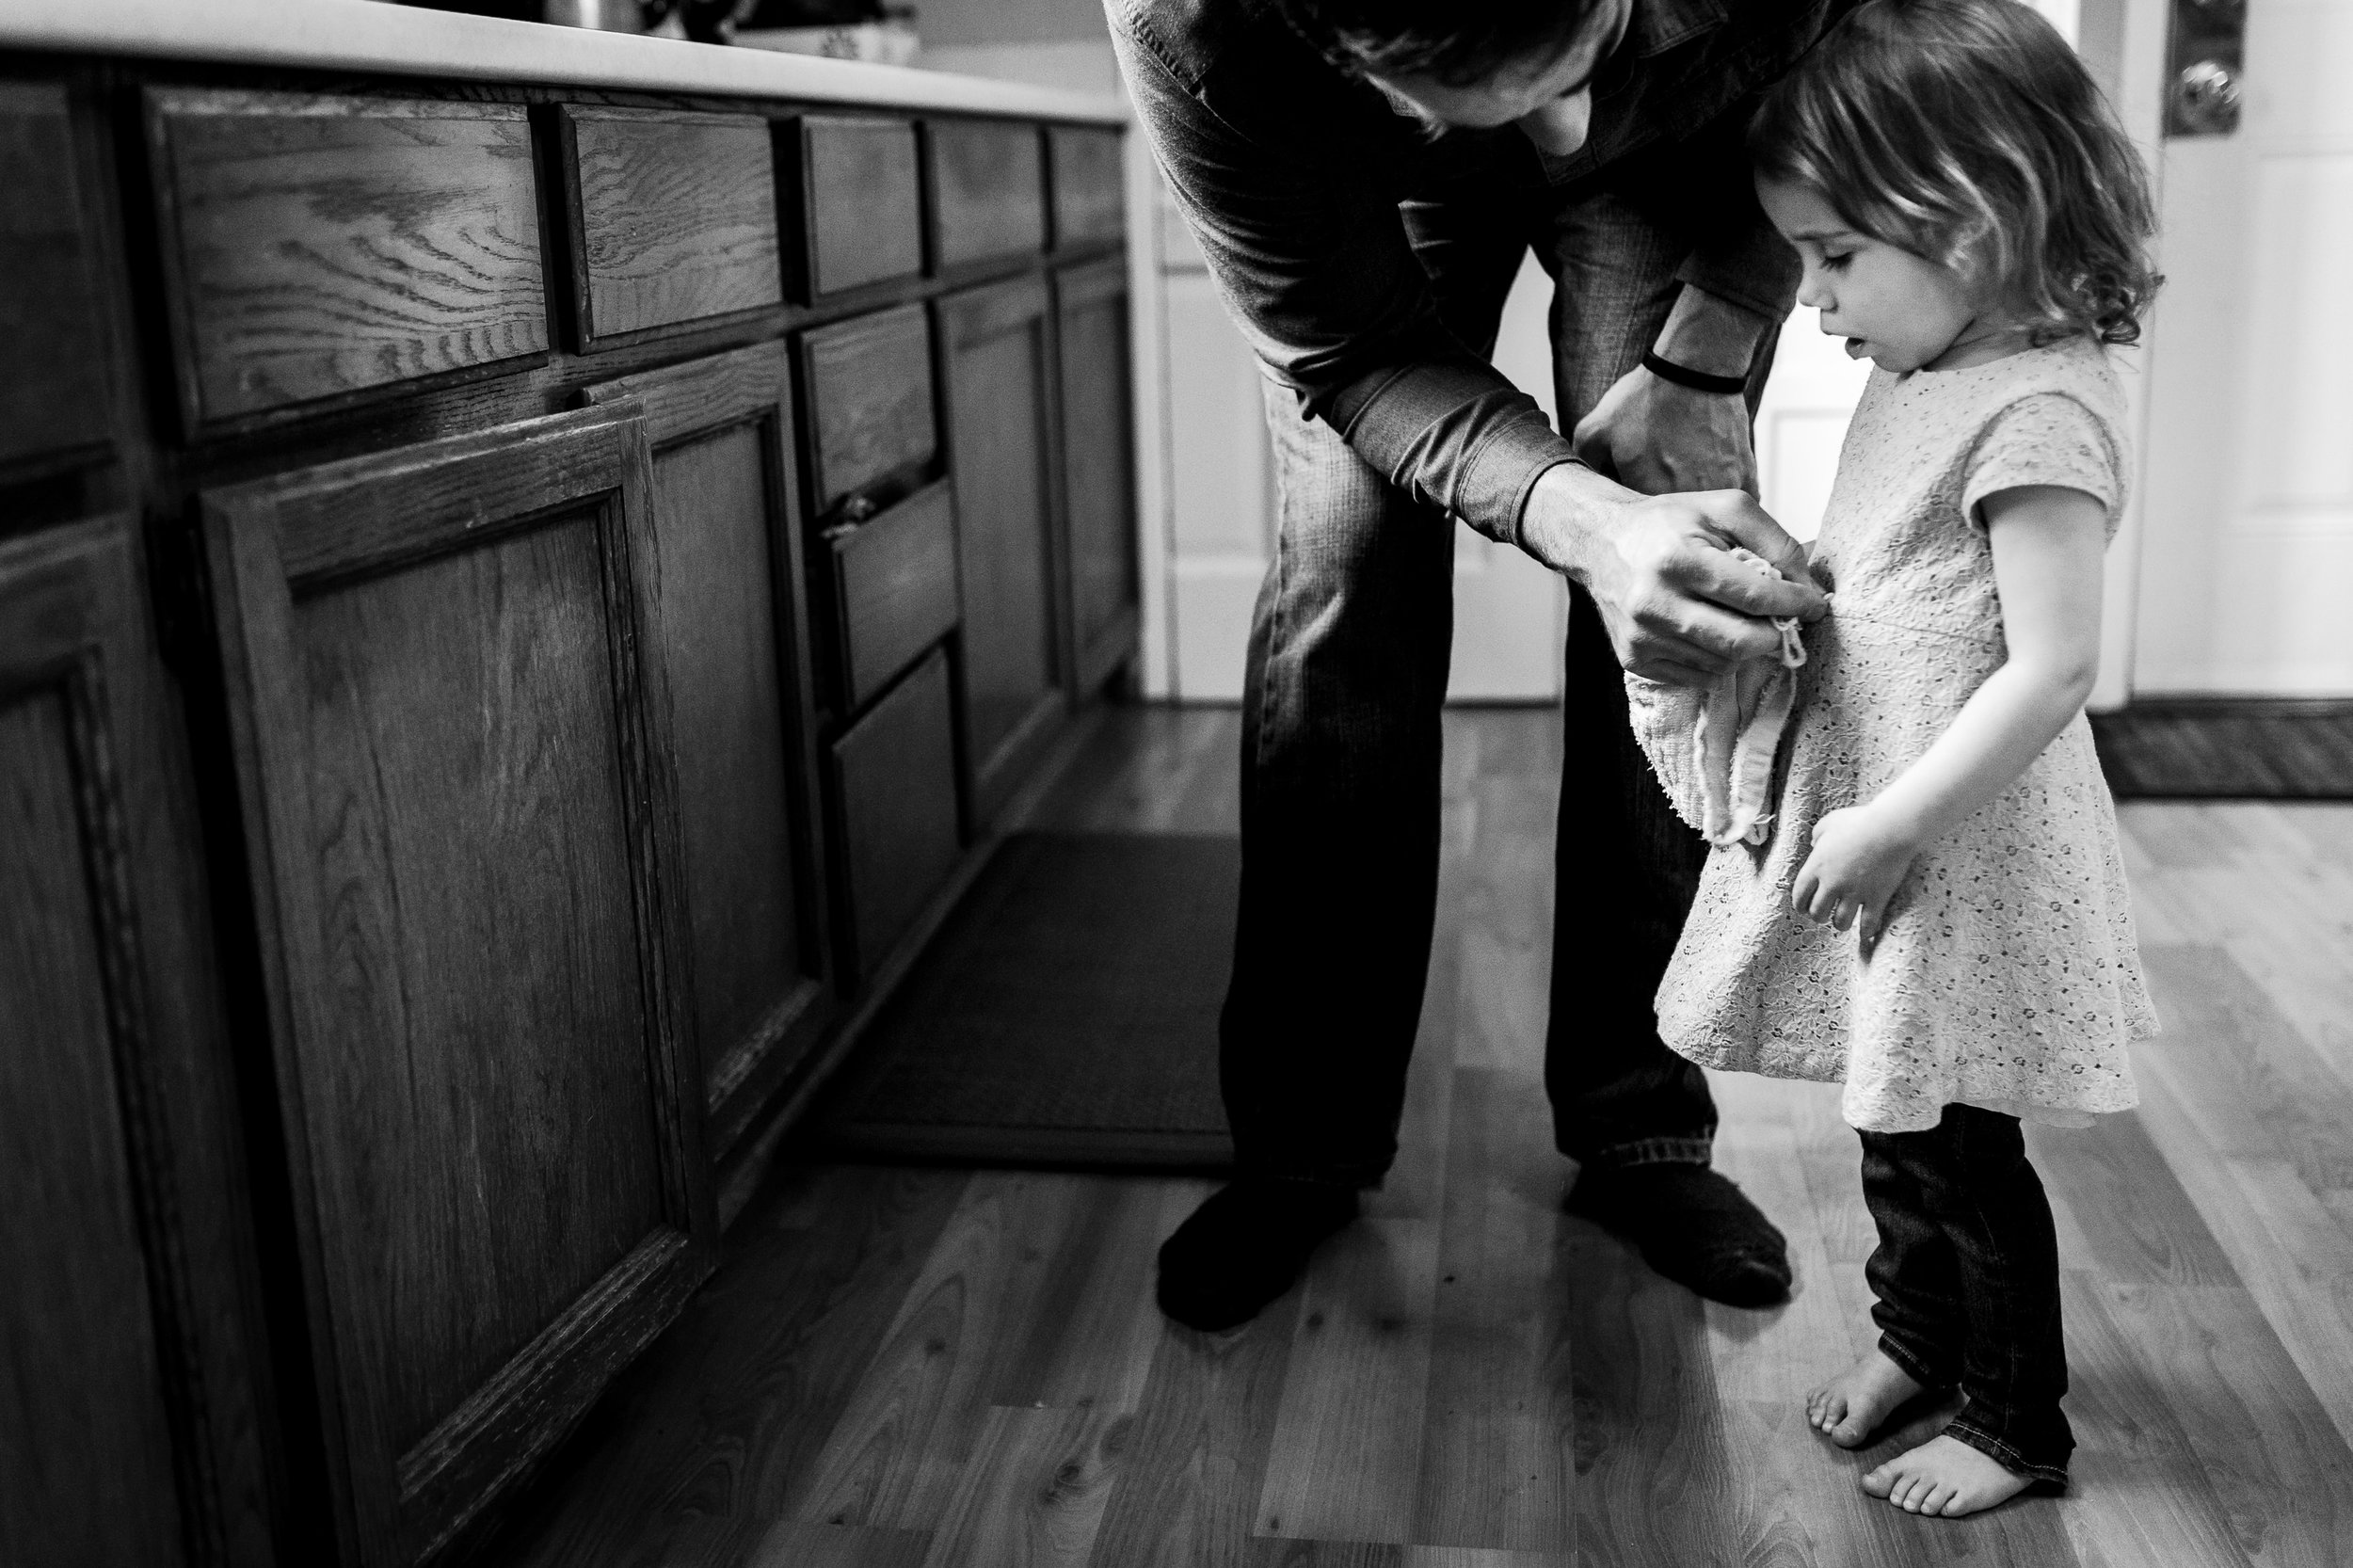 smoothie-kids-blentec-documentary-family-photo-love